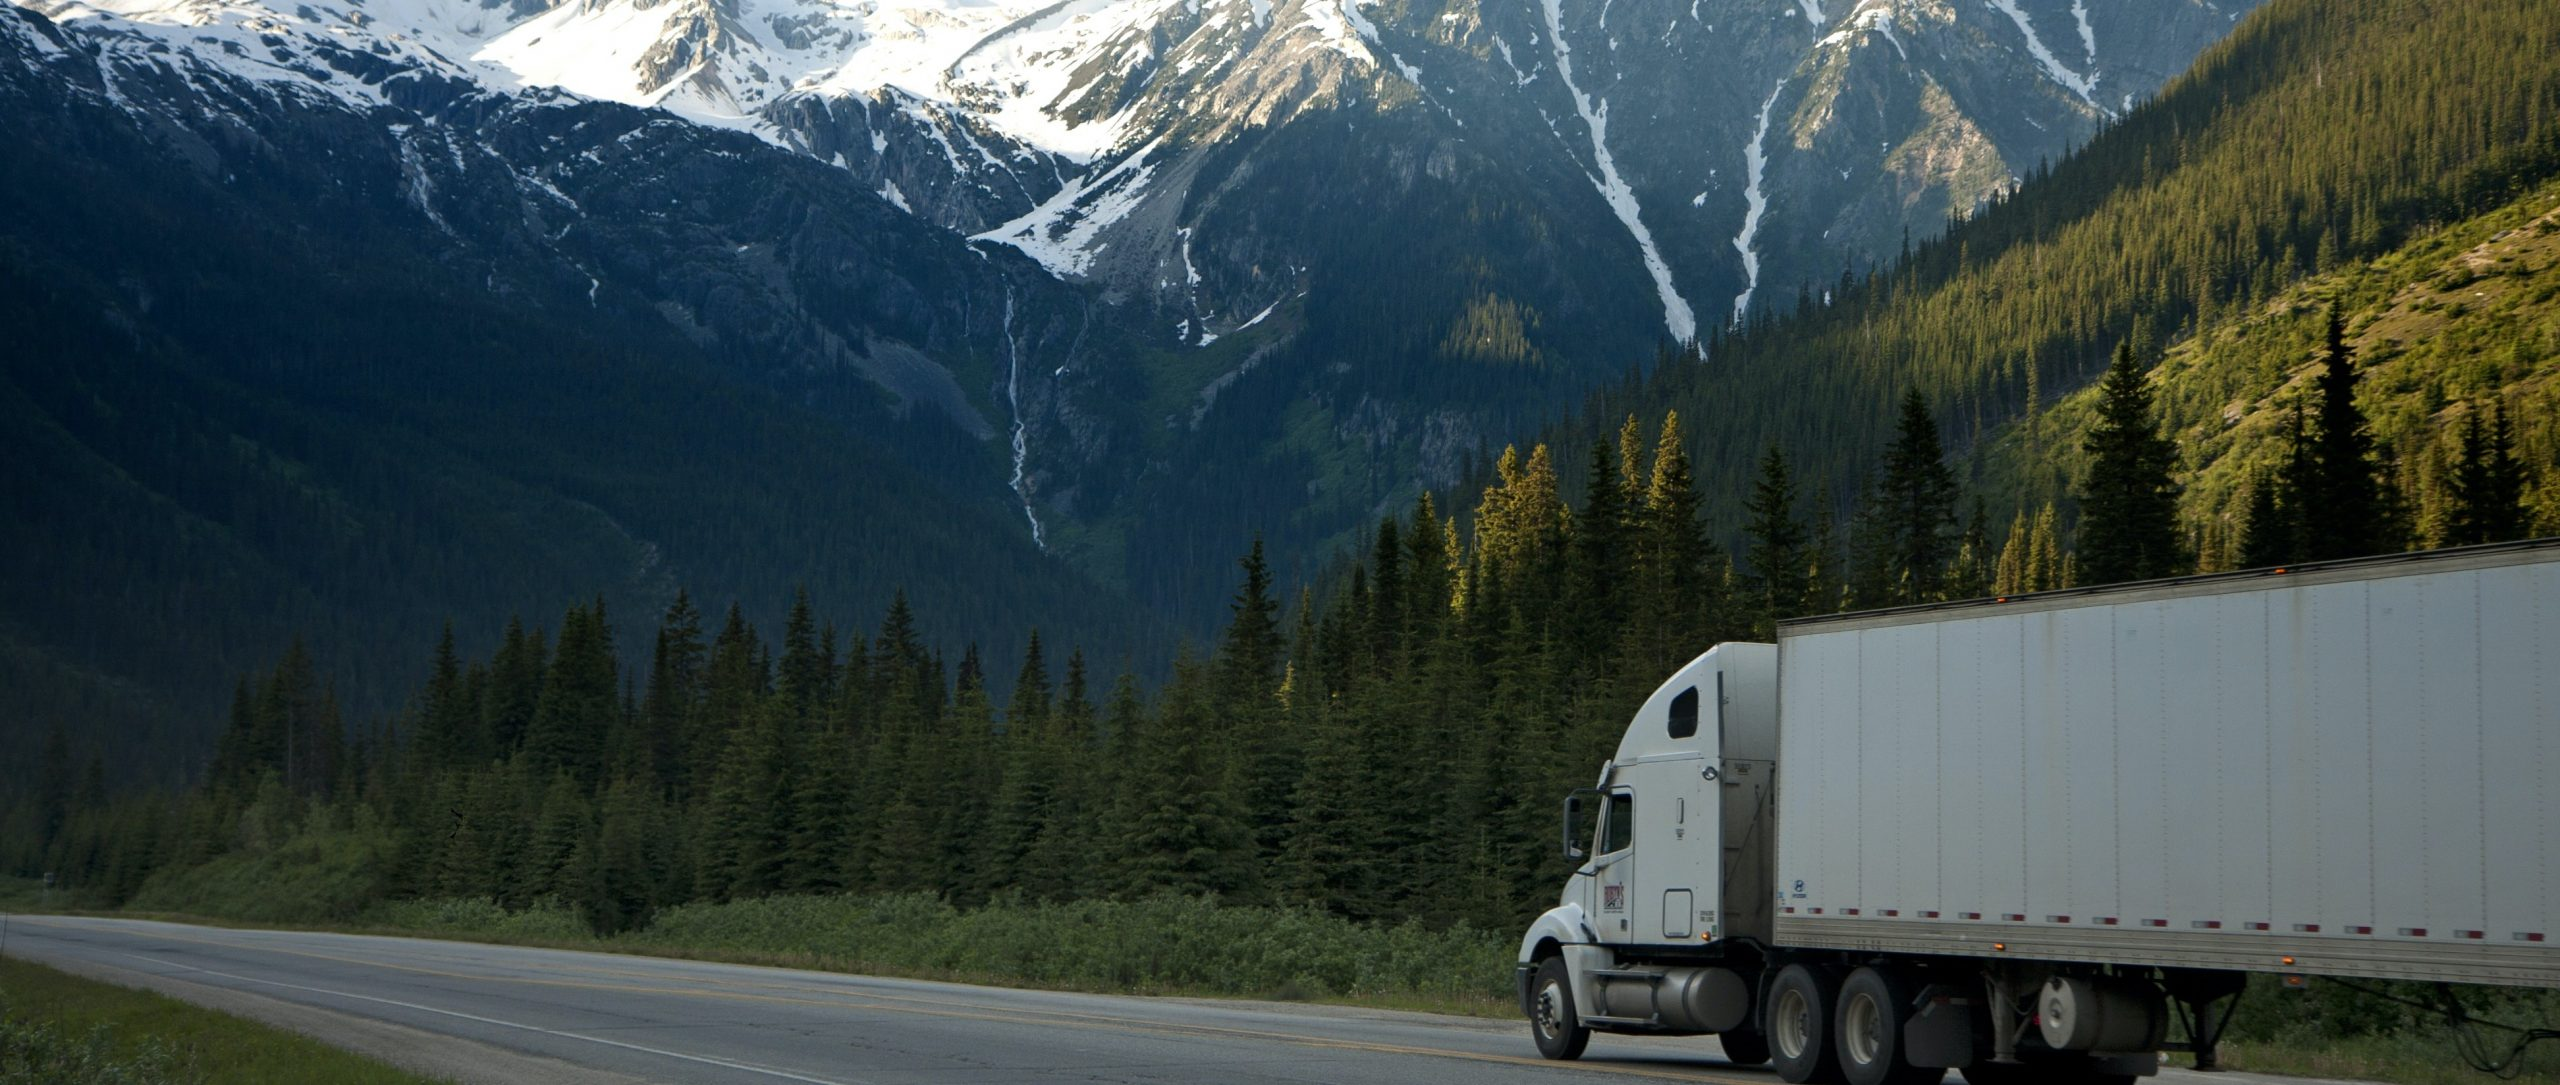 Truck-landscape